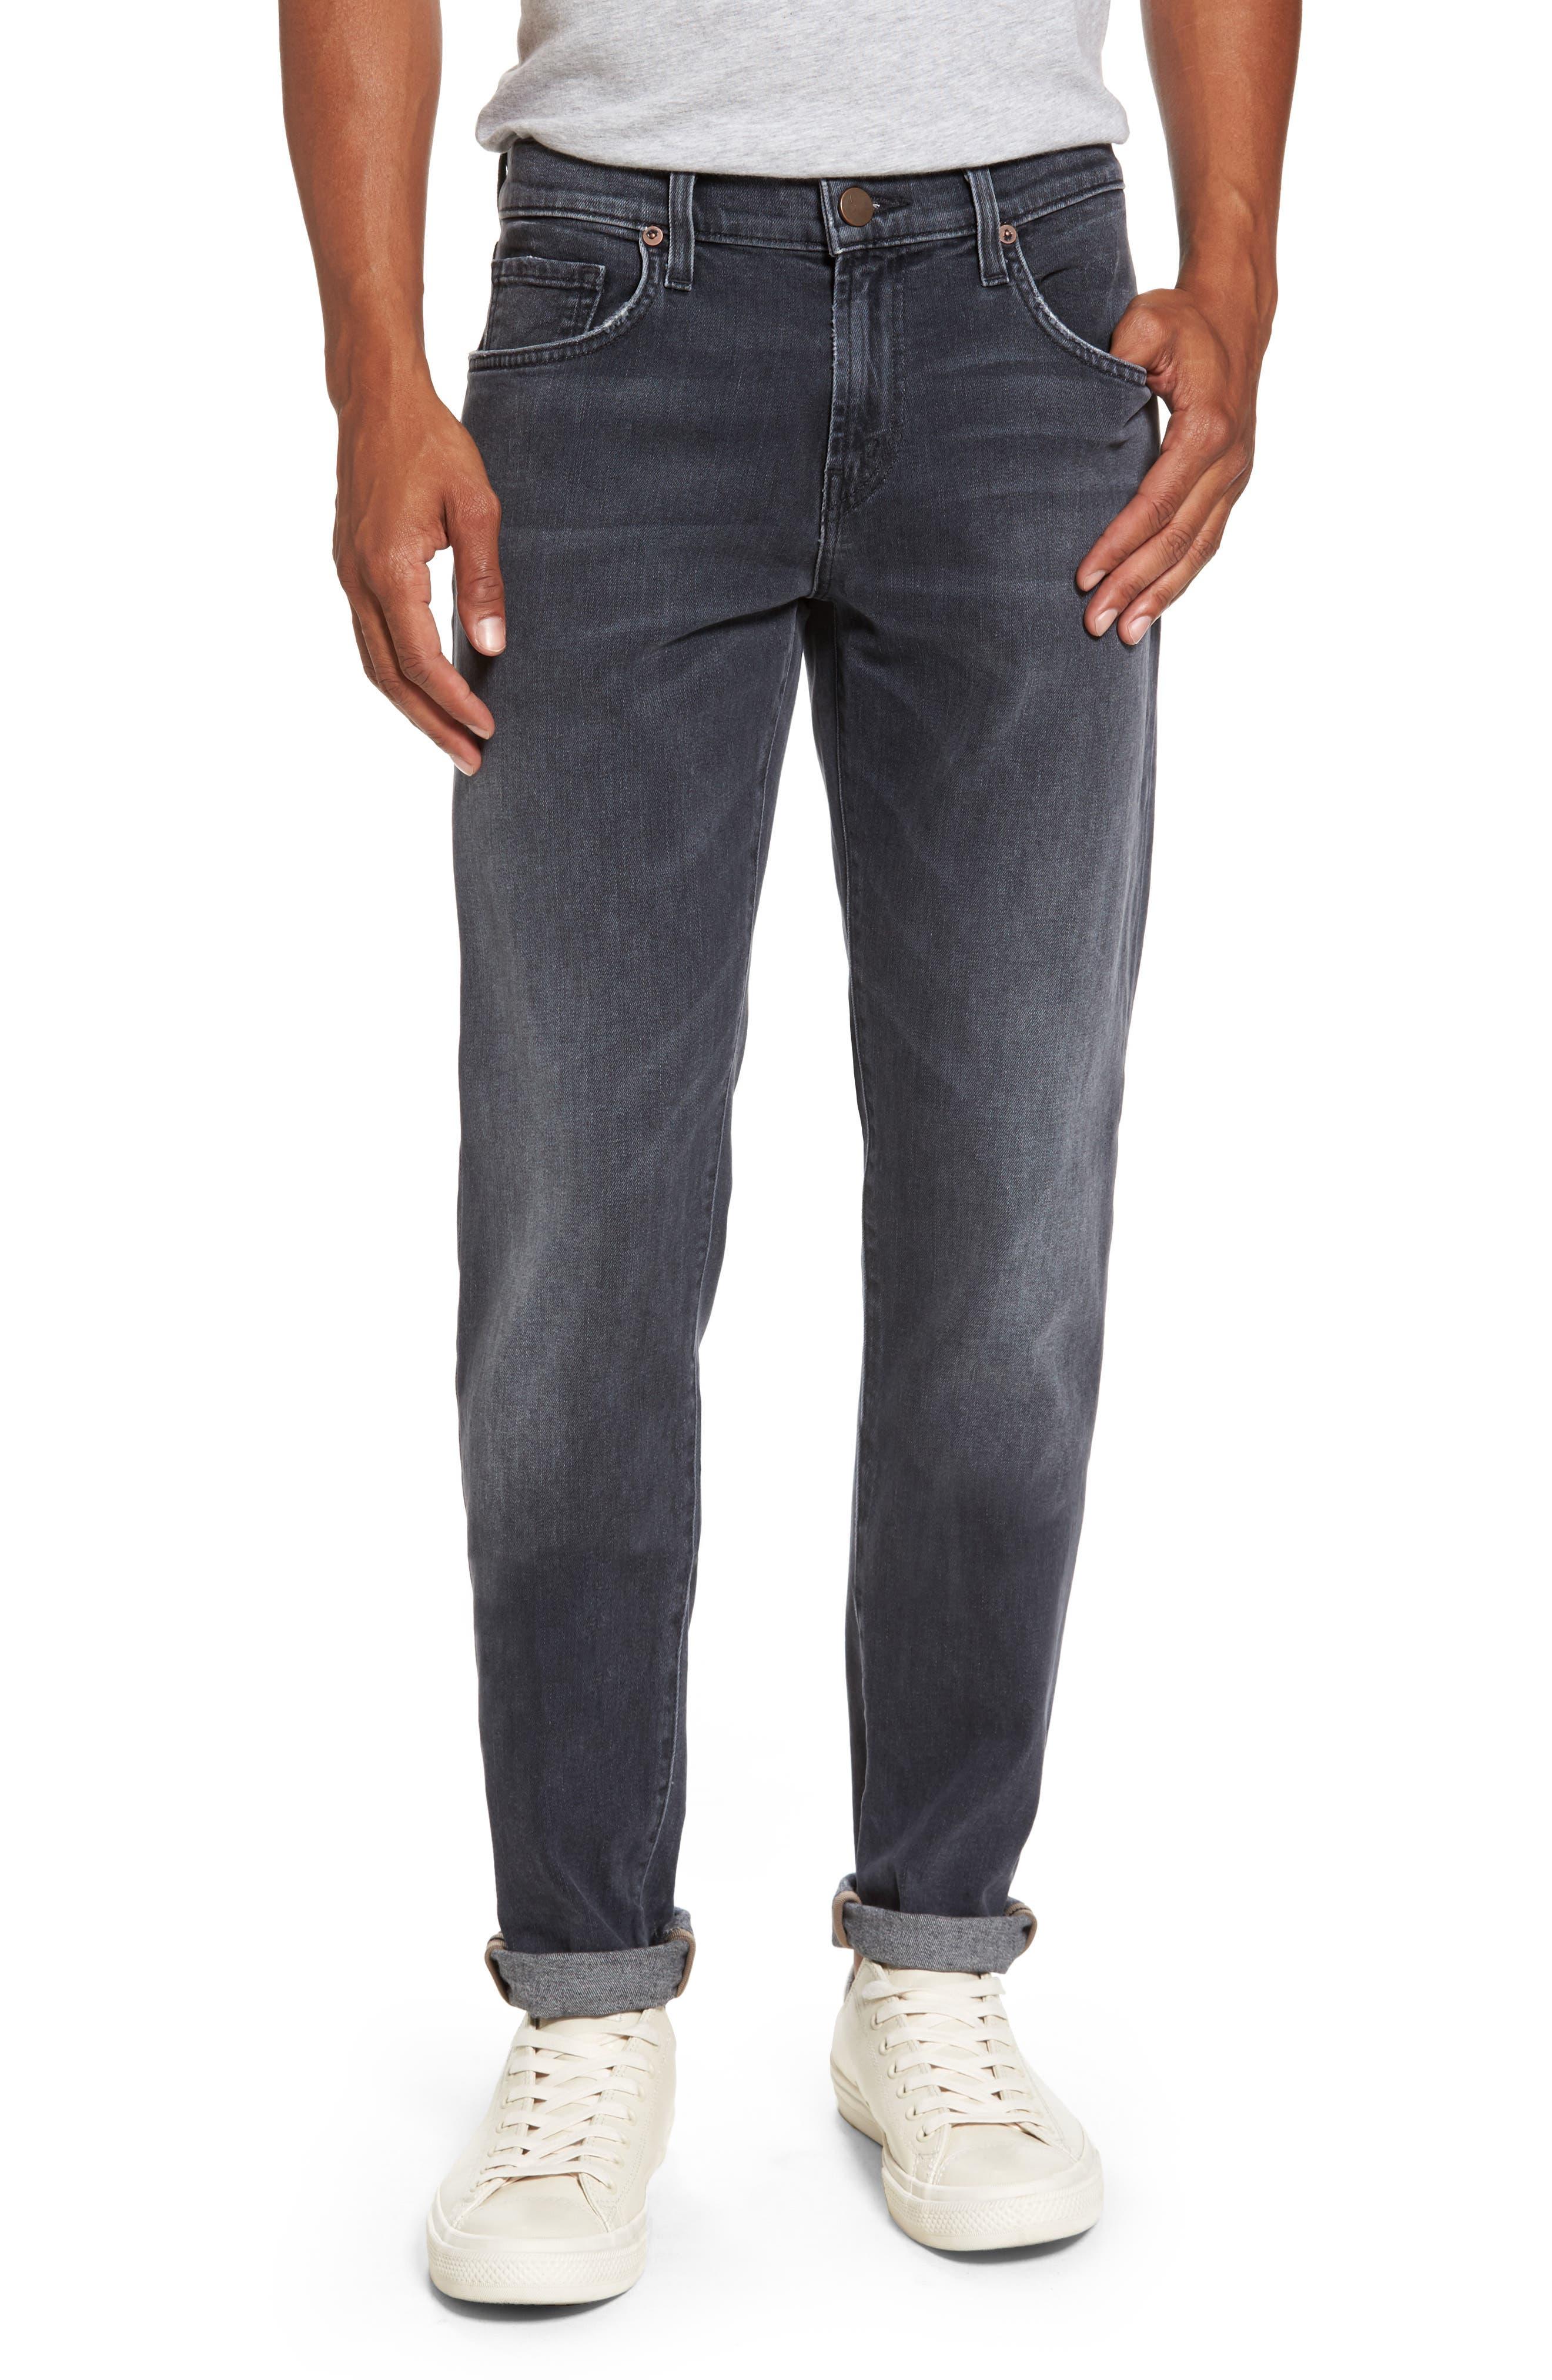 Alternate Image 1 Selected - J Brand Tyler Slim Jeans (Sagitarii)